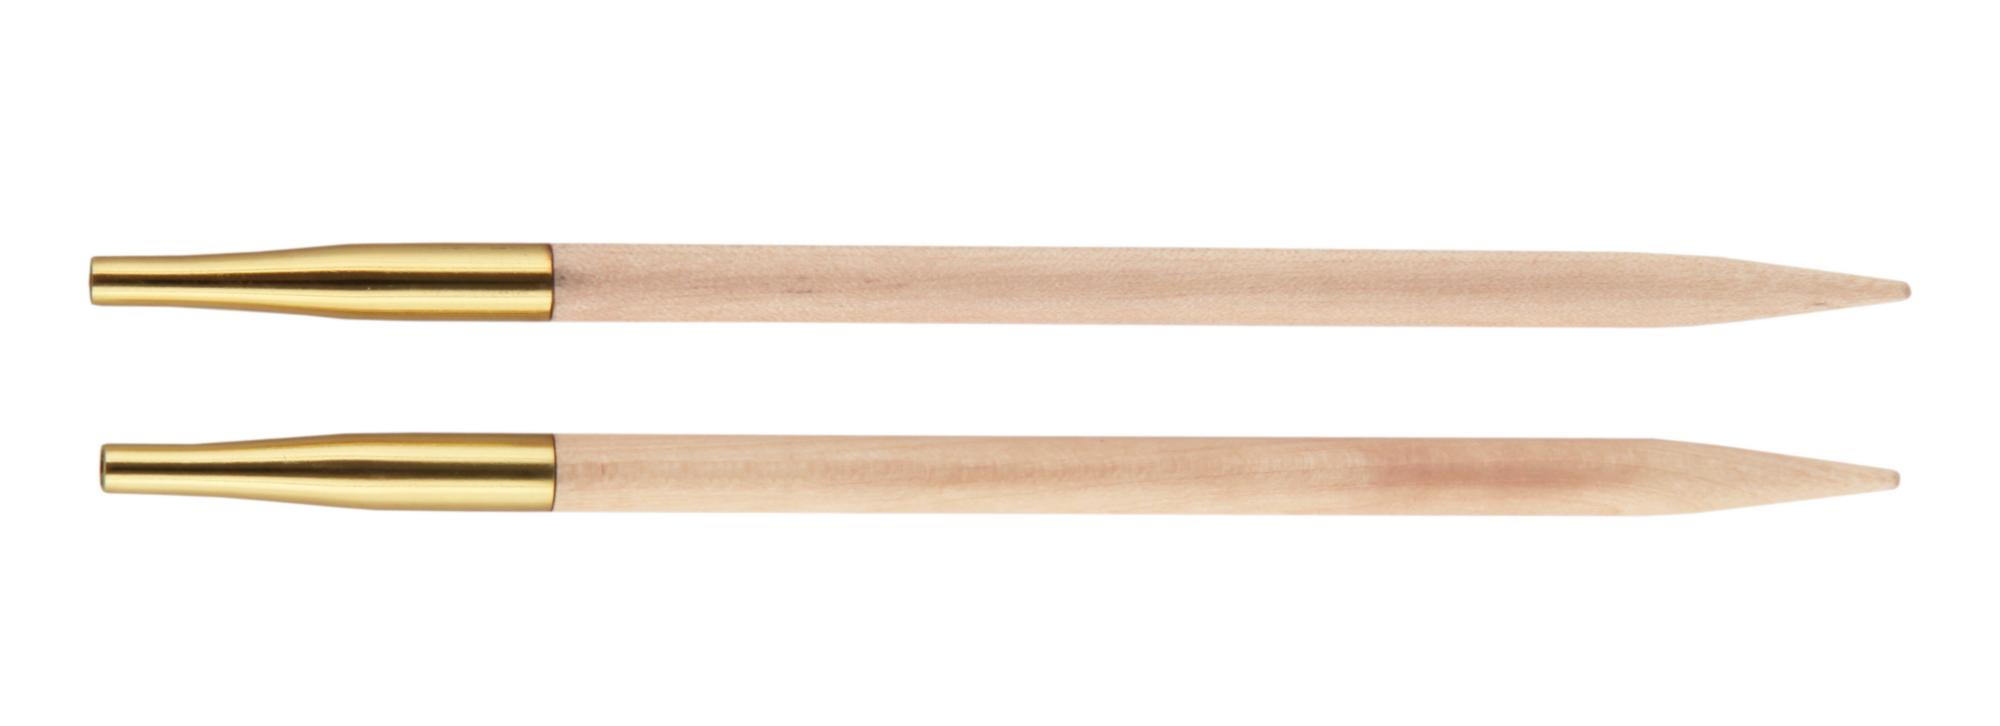 Спицы съемные короткие Basix Birch Wood KnitPro, 35656, 4.50 мм